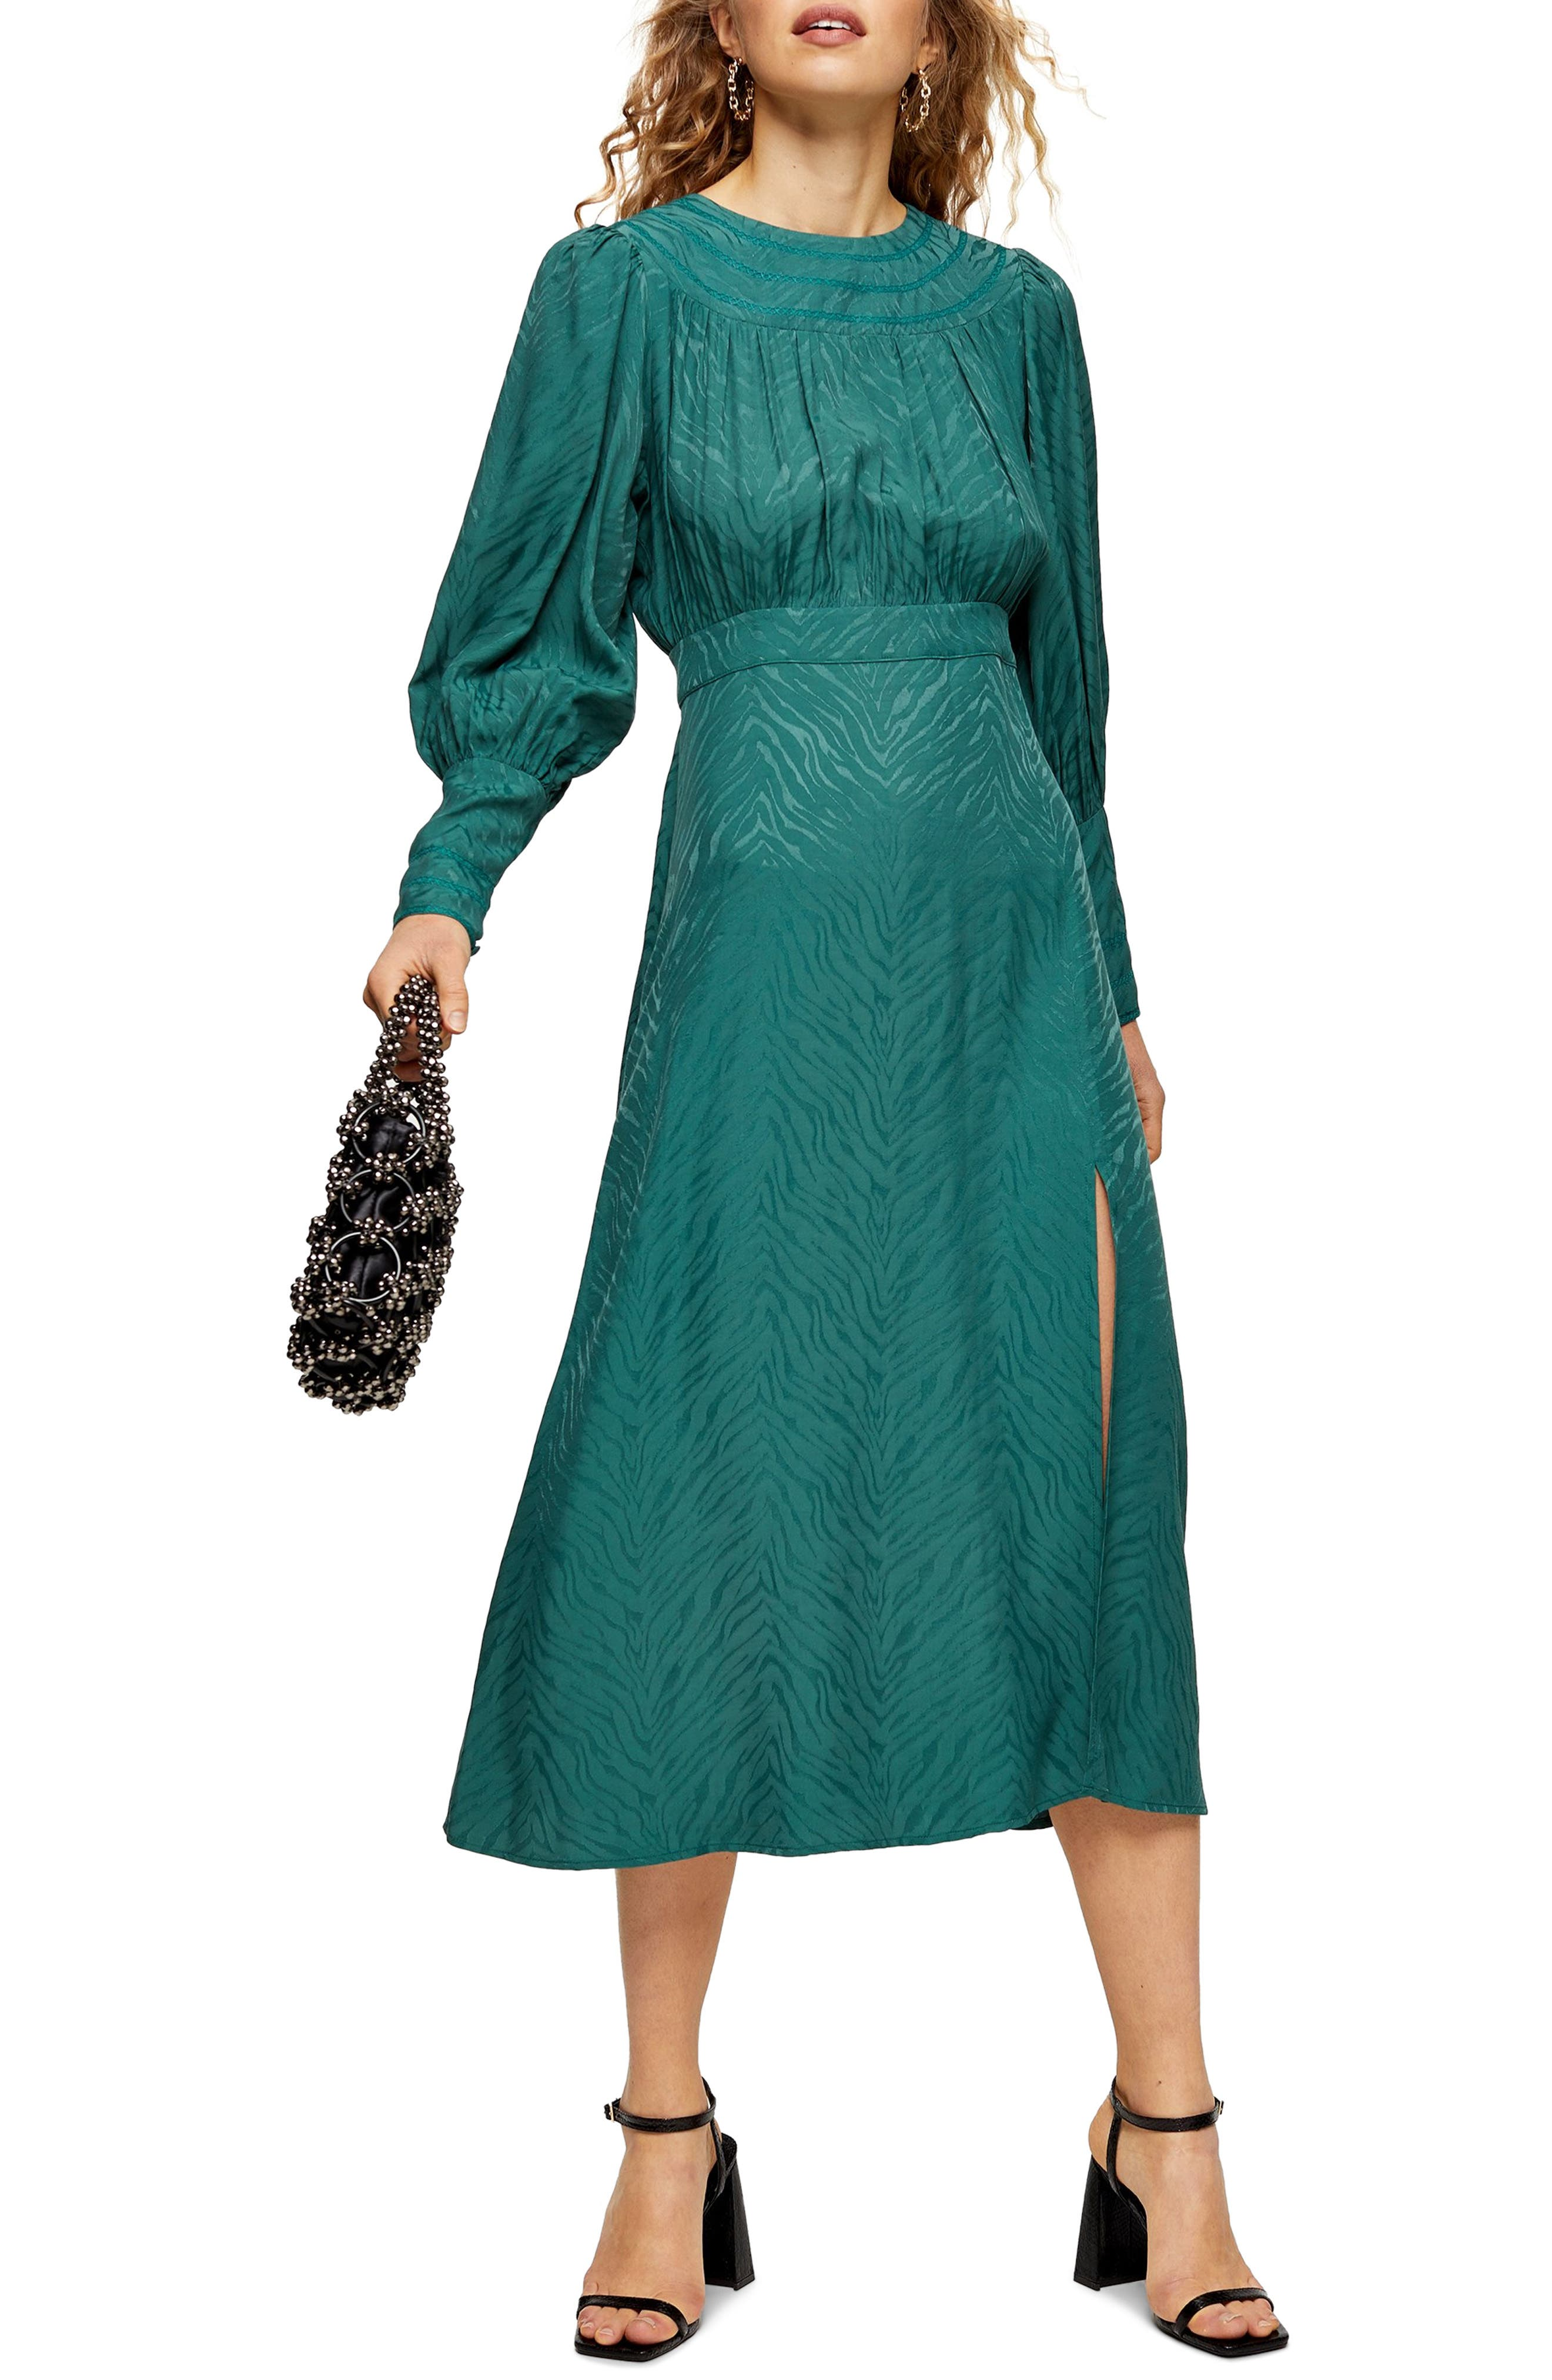 Vintage 1920s Dresses – Where to Buy Womens Topshop Fallen Long Sleeve Jacquard Midi Dress $95.00 AT vintagedancer.com